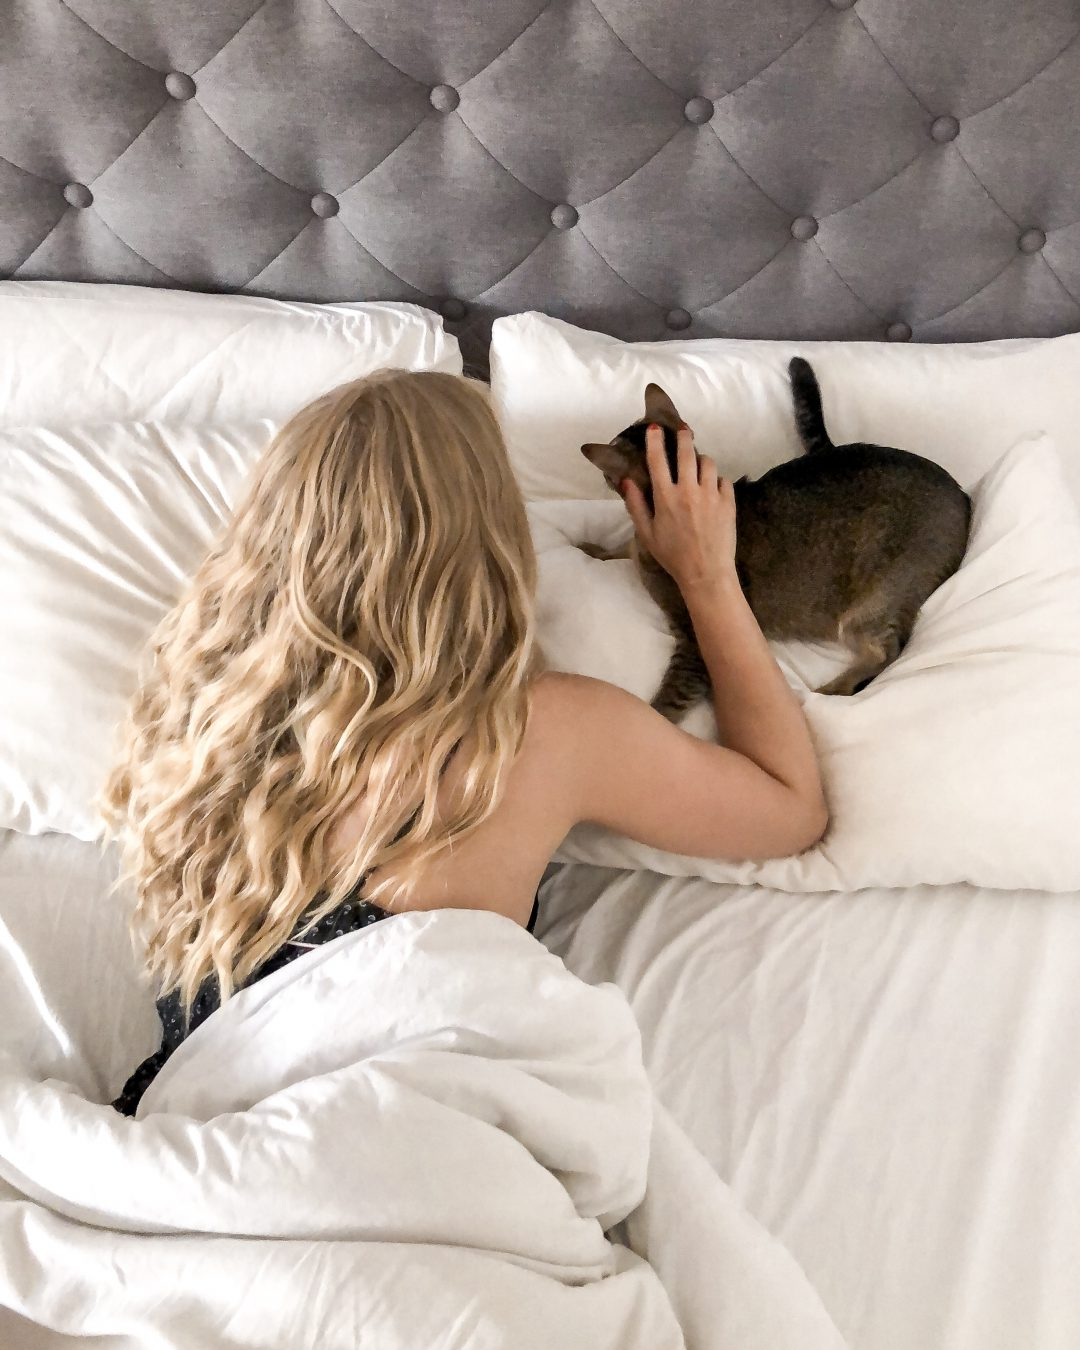 Eva_Jasmin_Felix_Kolumne_Cat_Content_Cuddles_Lingerie